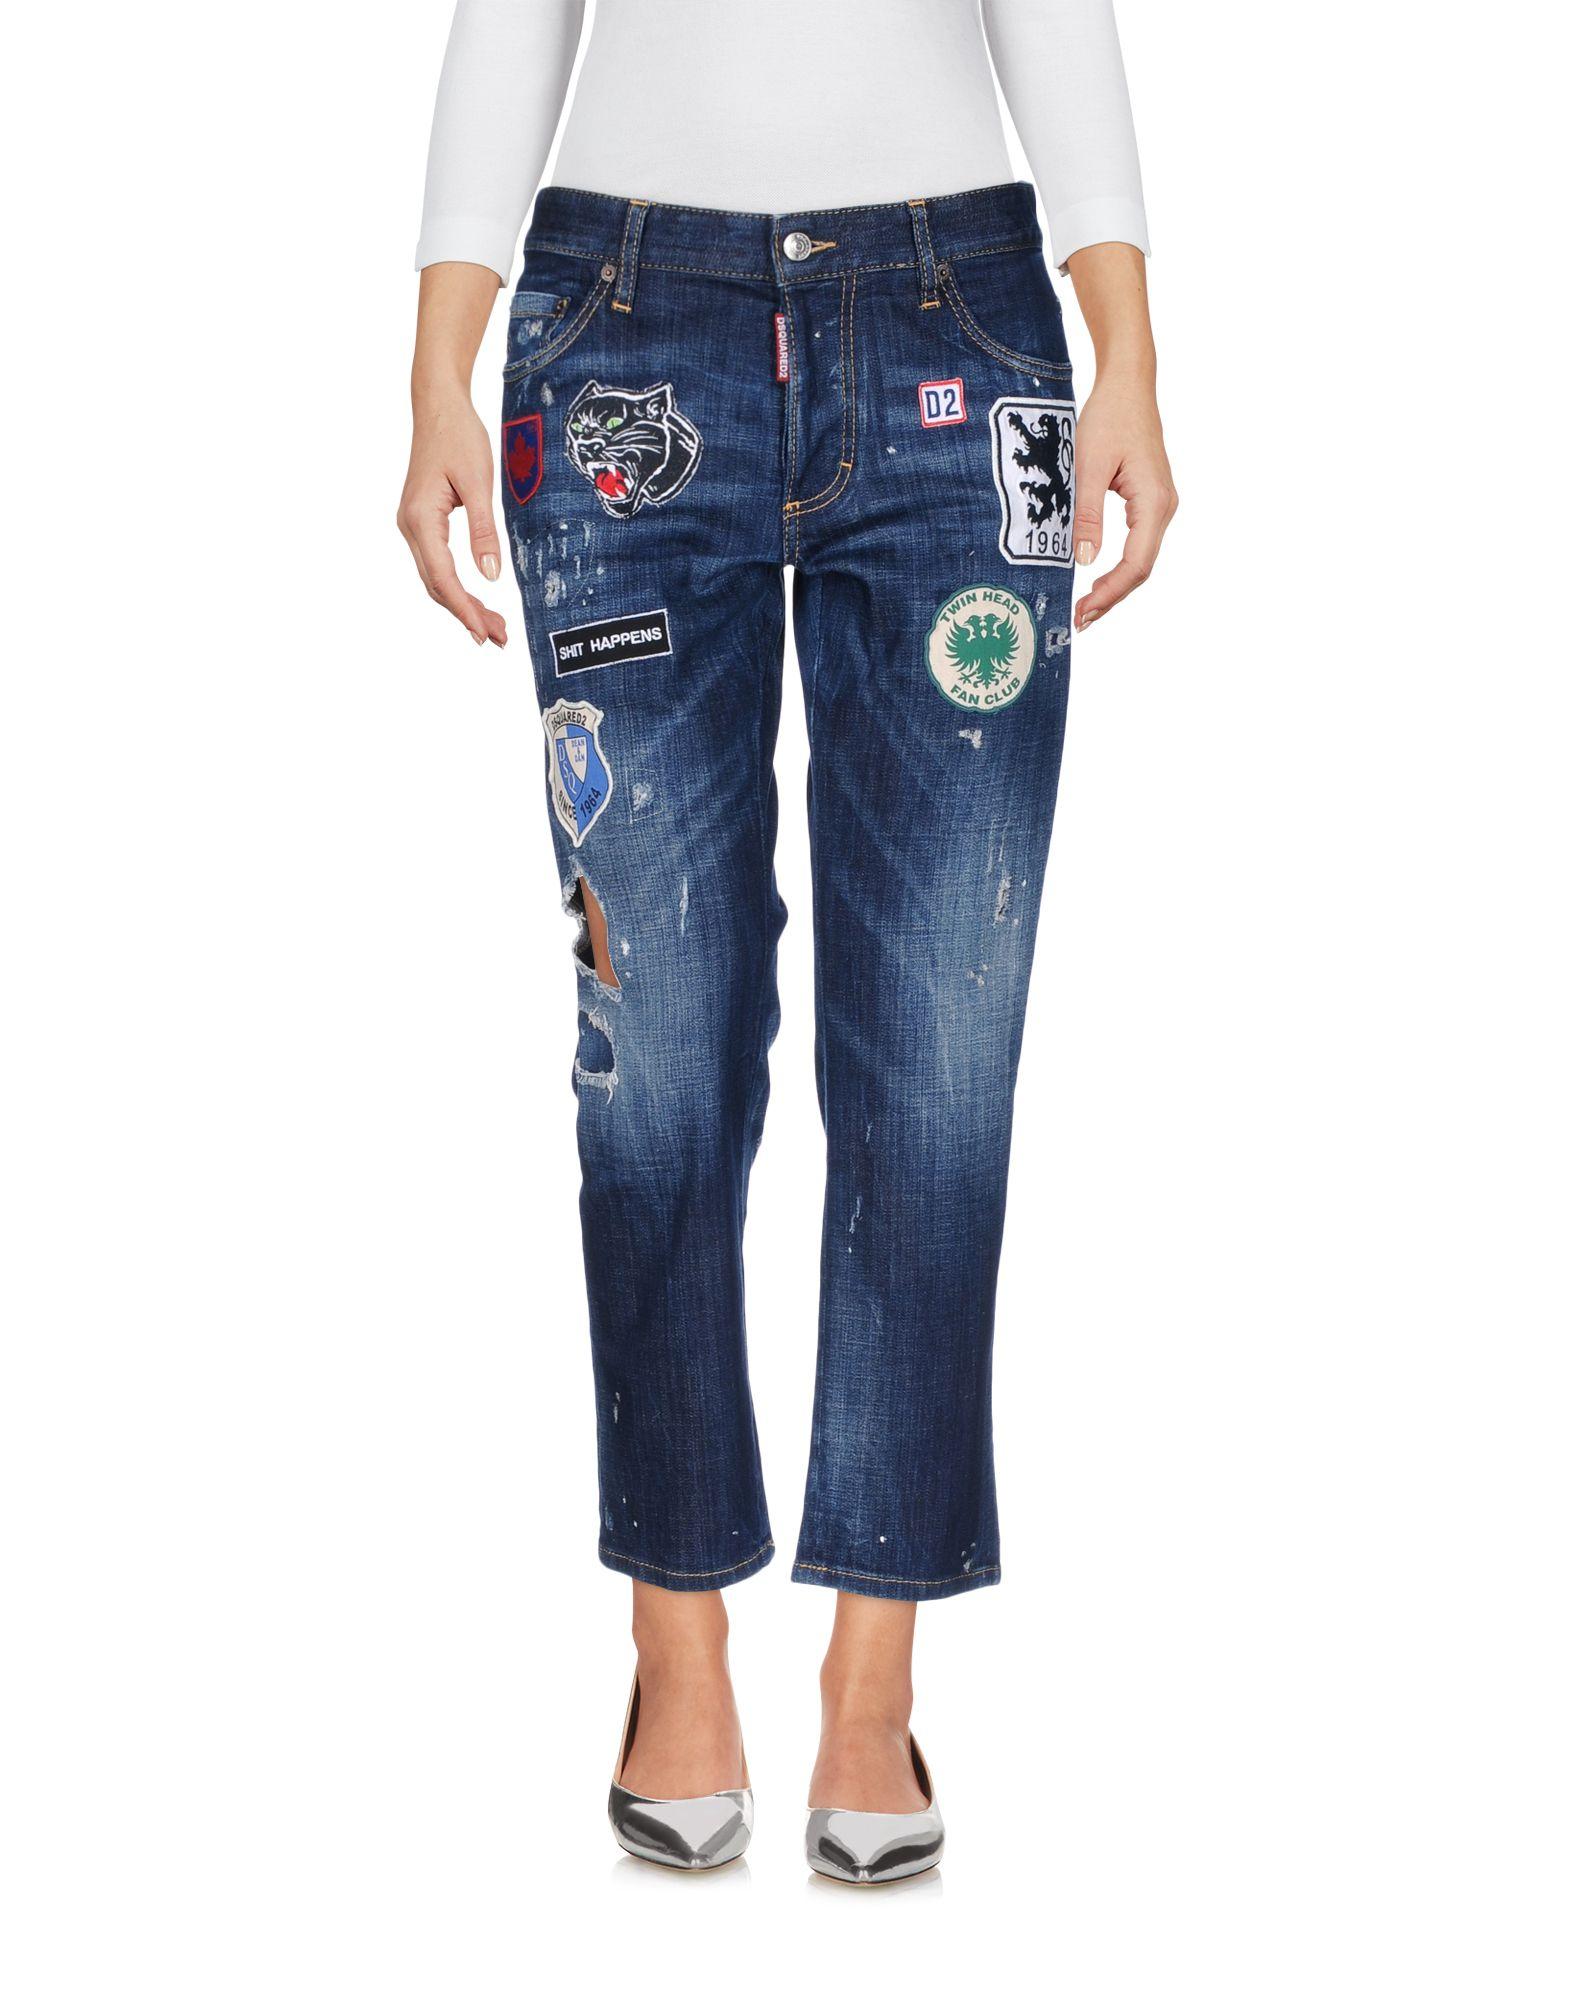 ФОТО dsquared2 Джинсовые брюки